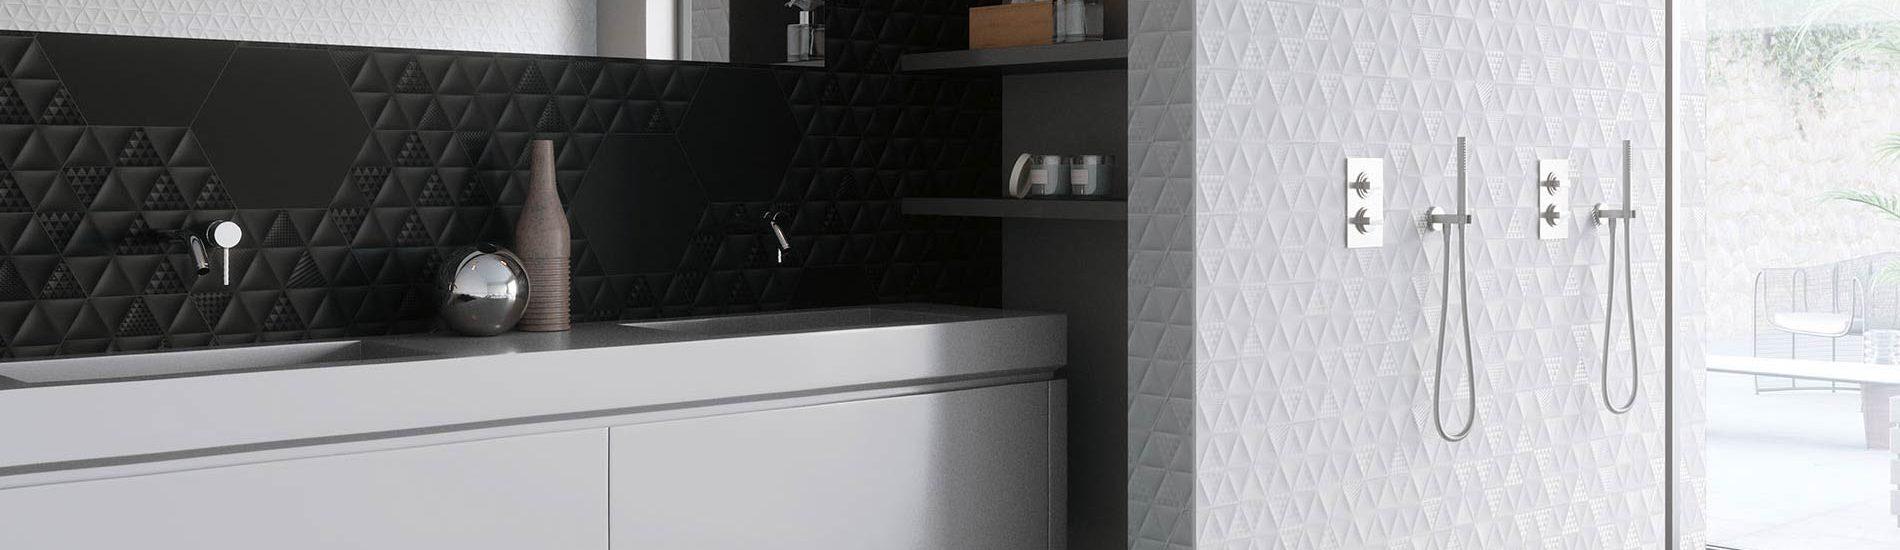 banner-malmo-3d-hexagon-deco-wall-tile-spainsh-itt-saniceramica